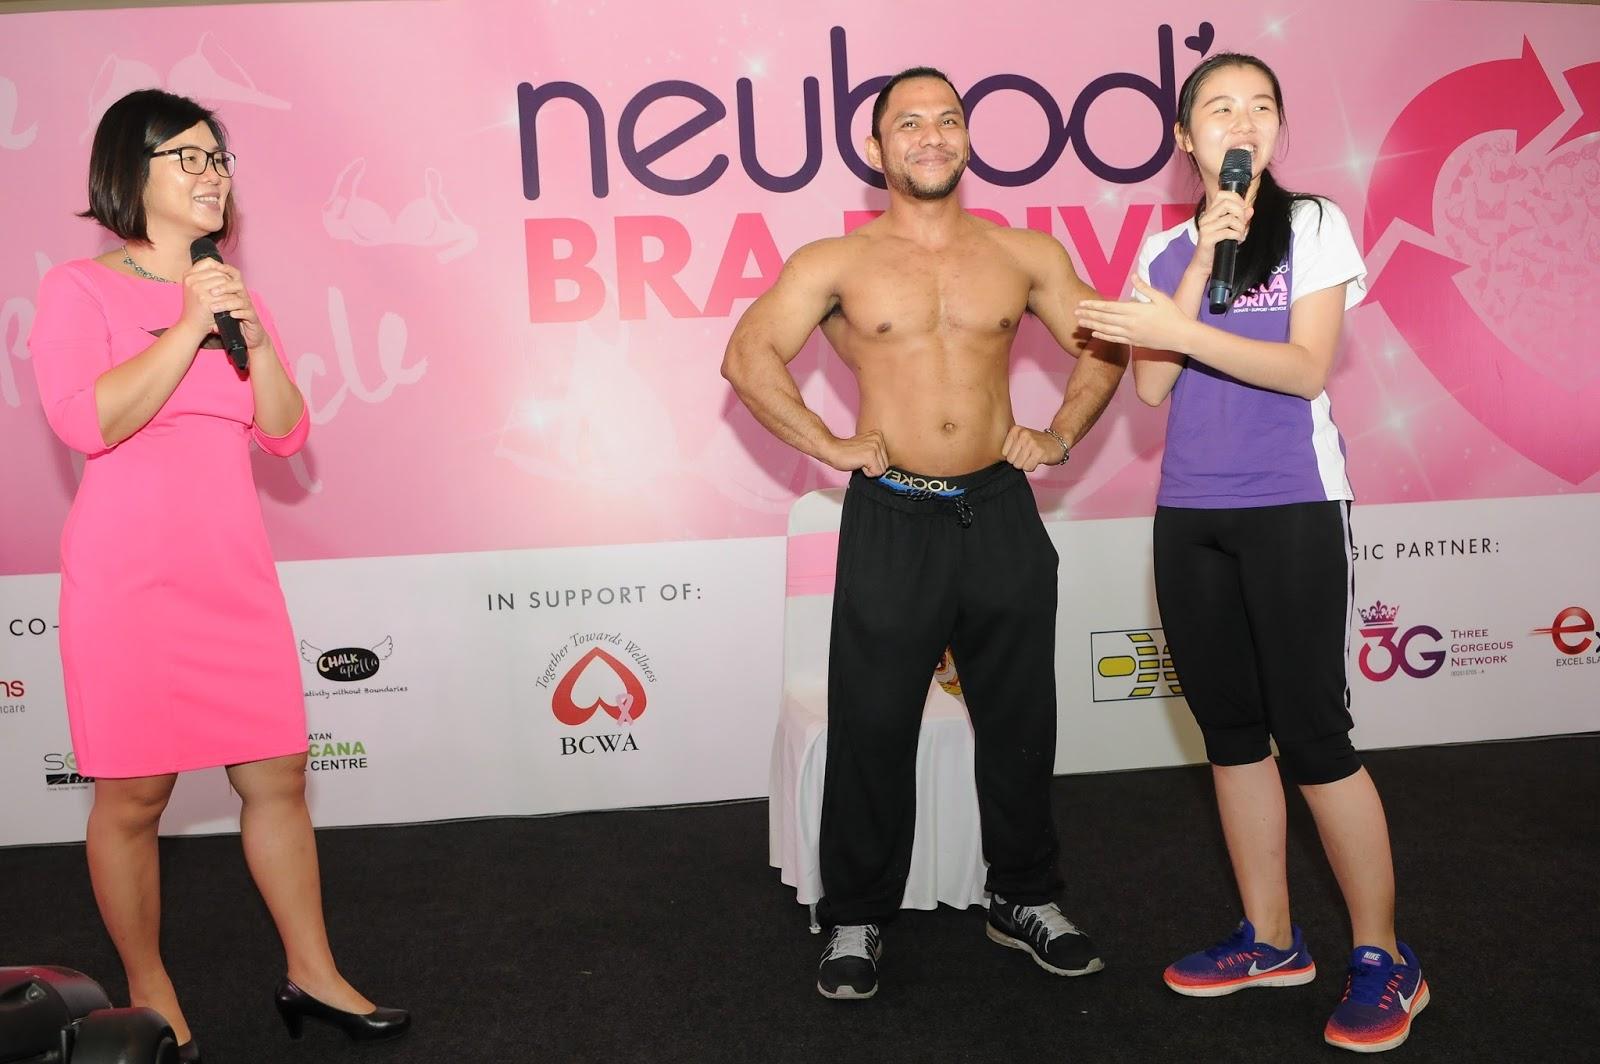 Bras & Bra Sets Initiative No Boundries Bra